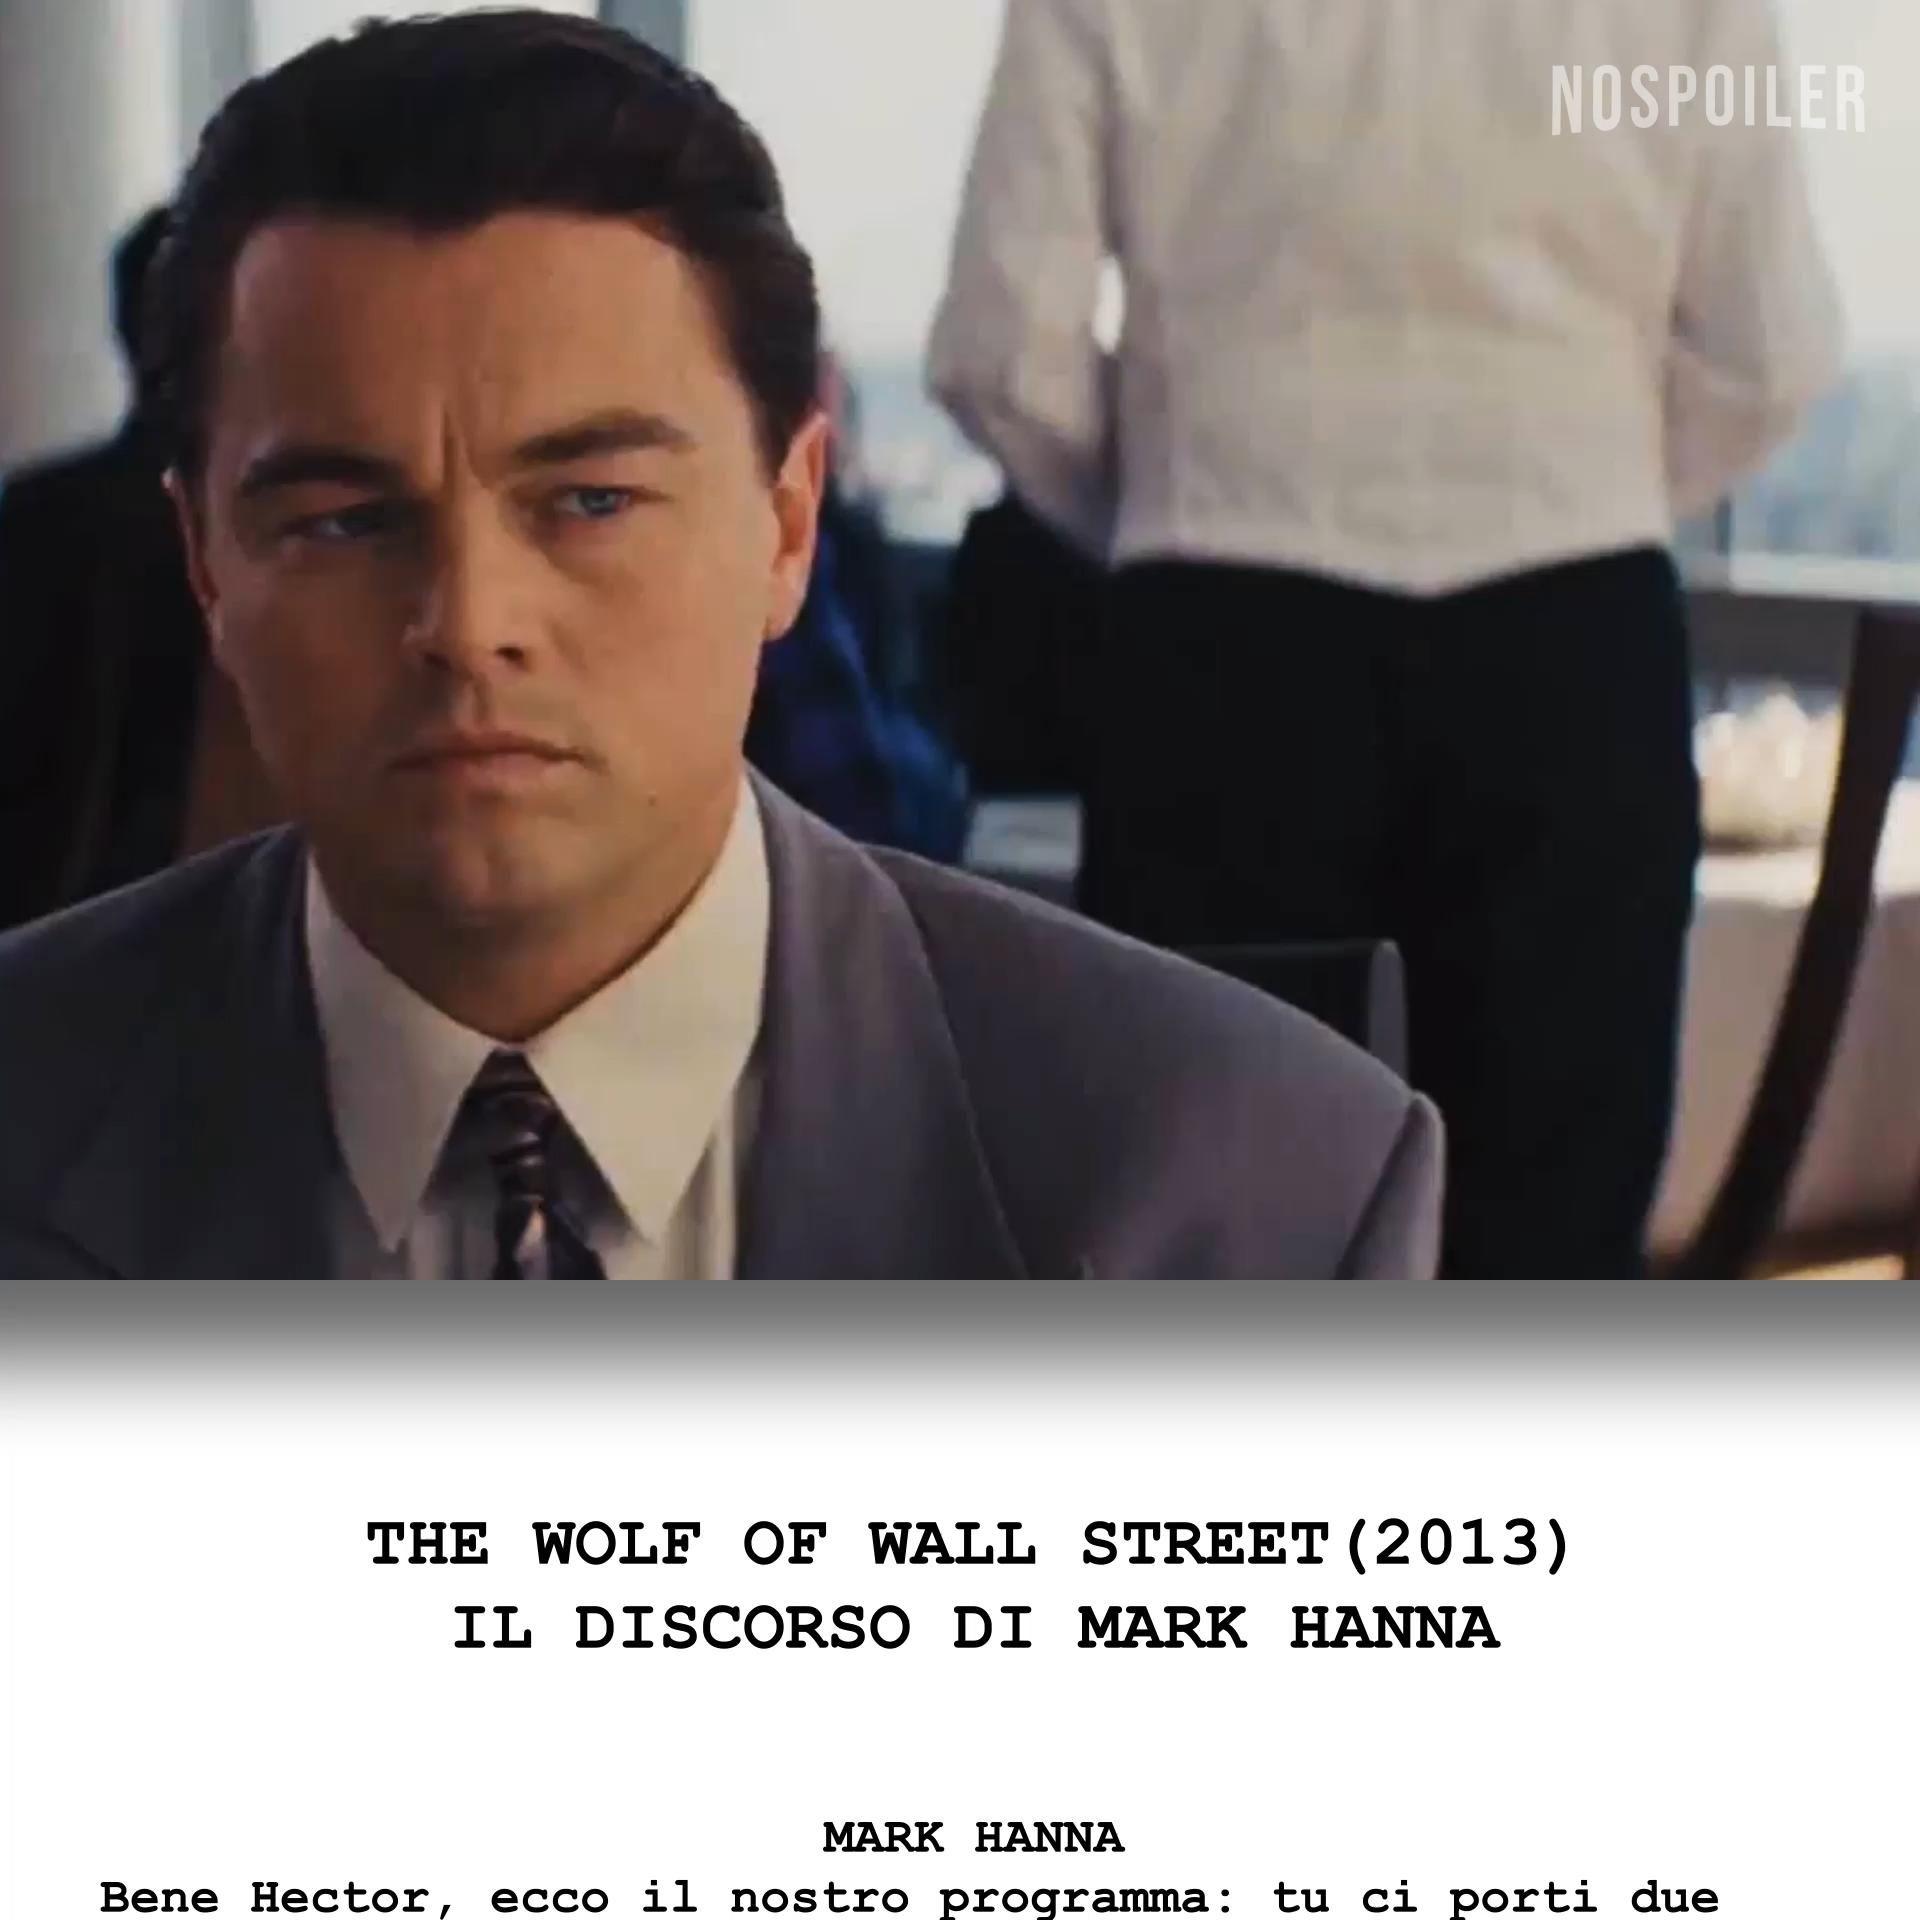 The Wolf Of Wall Street Il Discorso Di Mark Hanna Dialogo Video Matthew Mcconaughey Wall Street Film